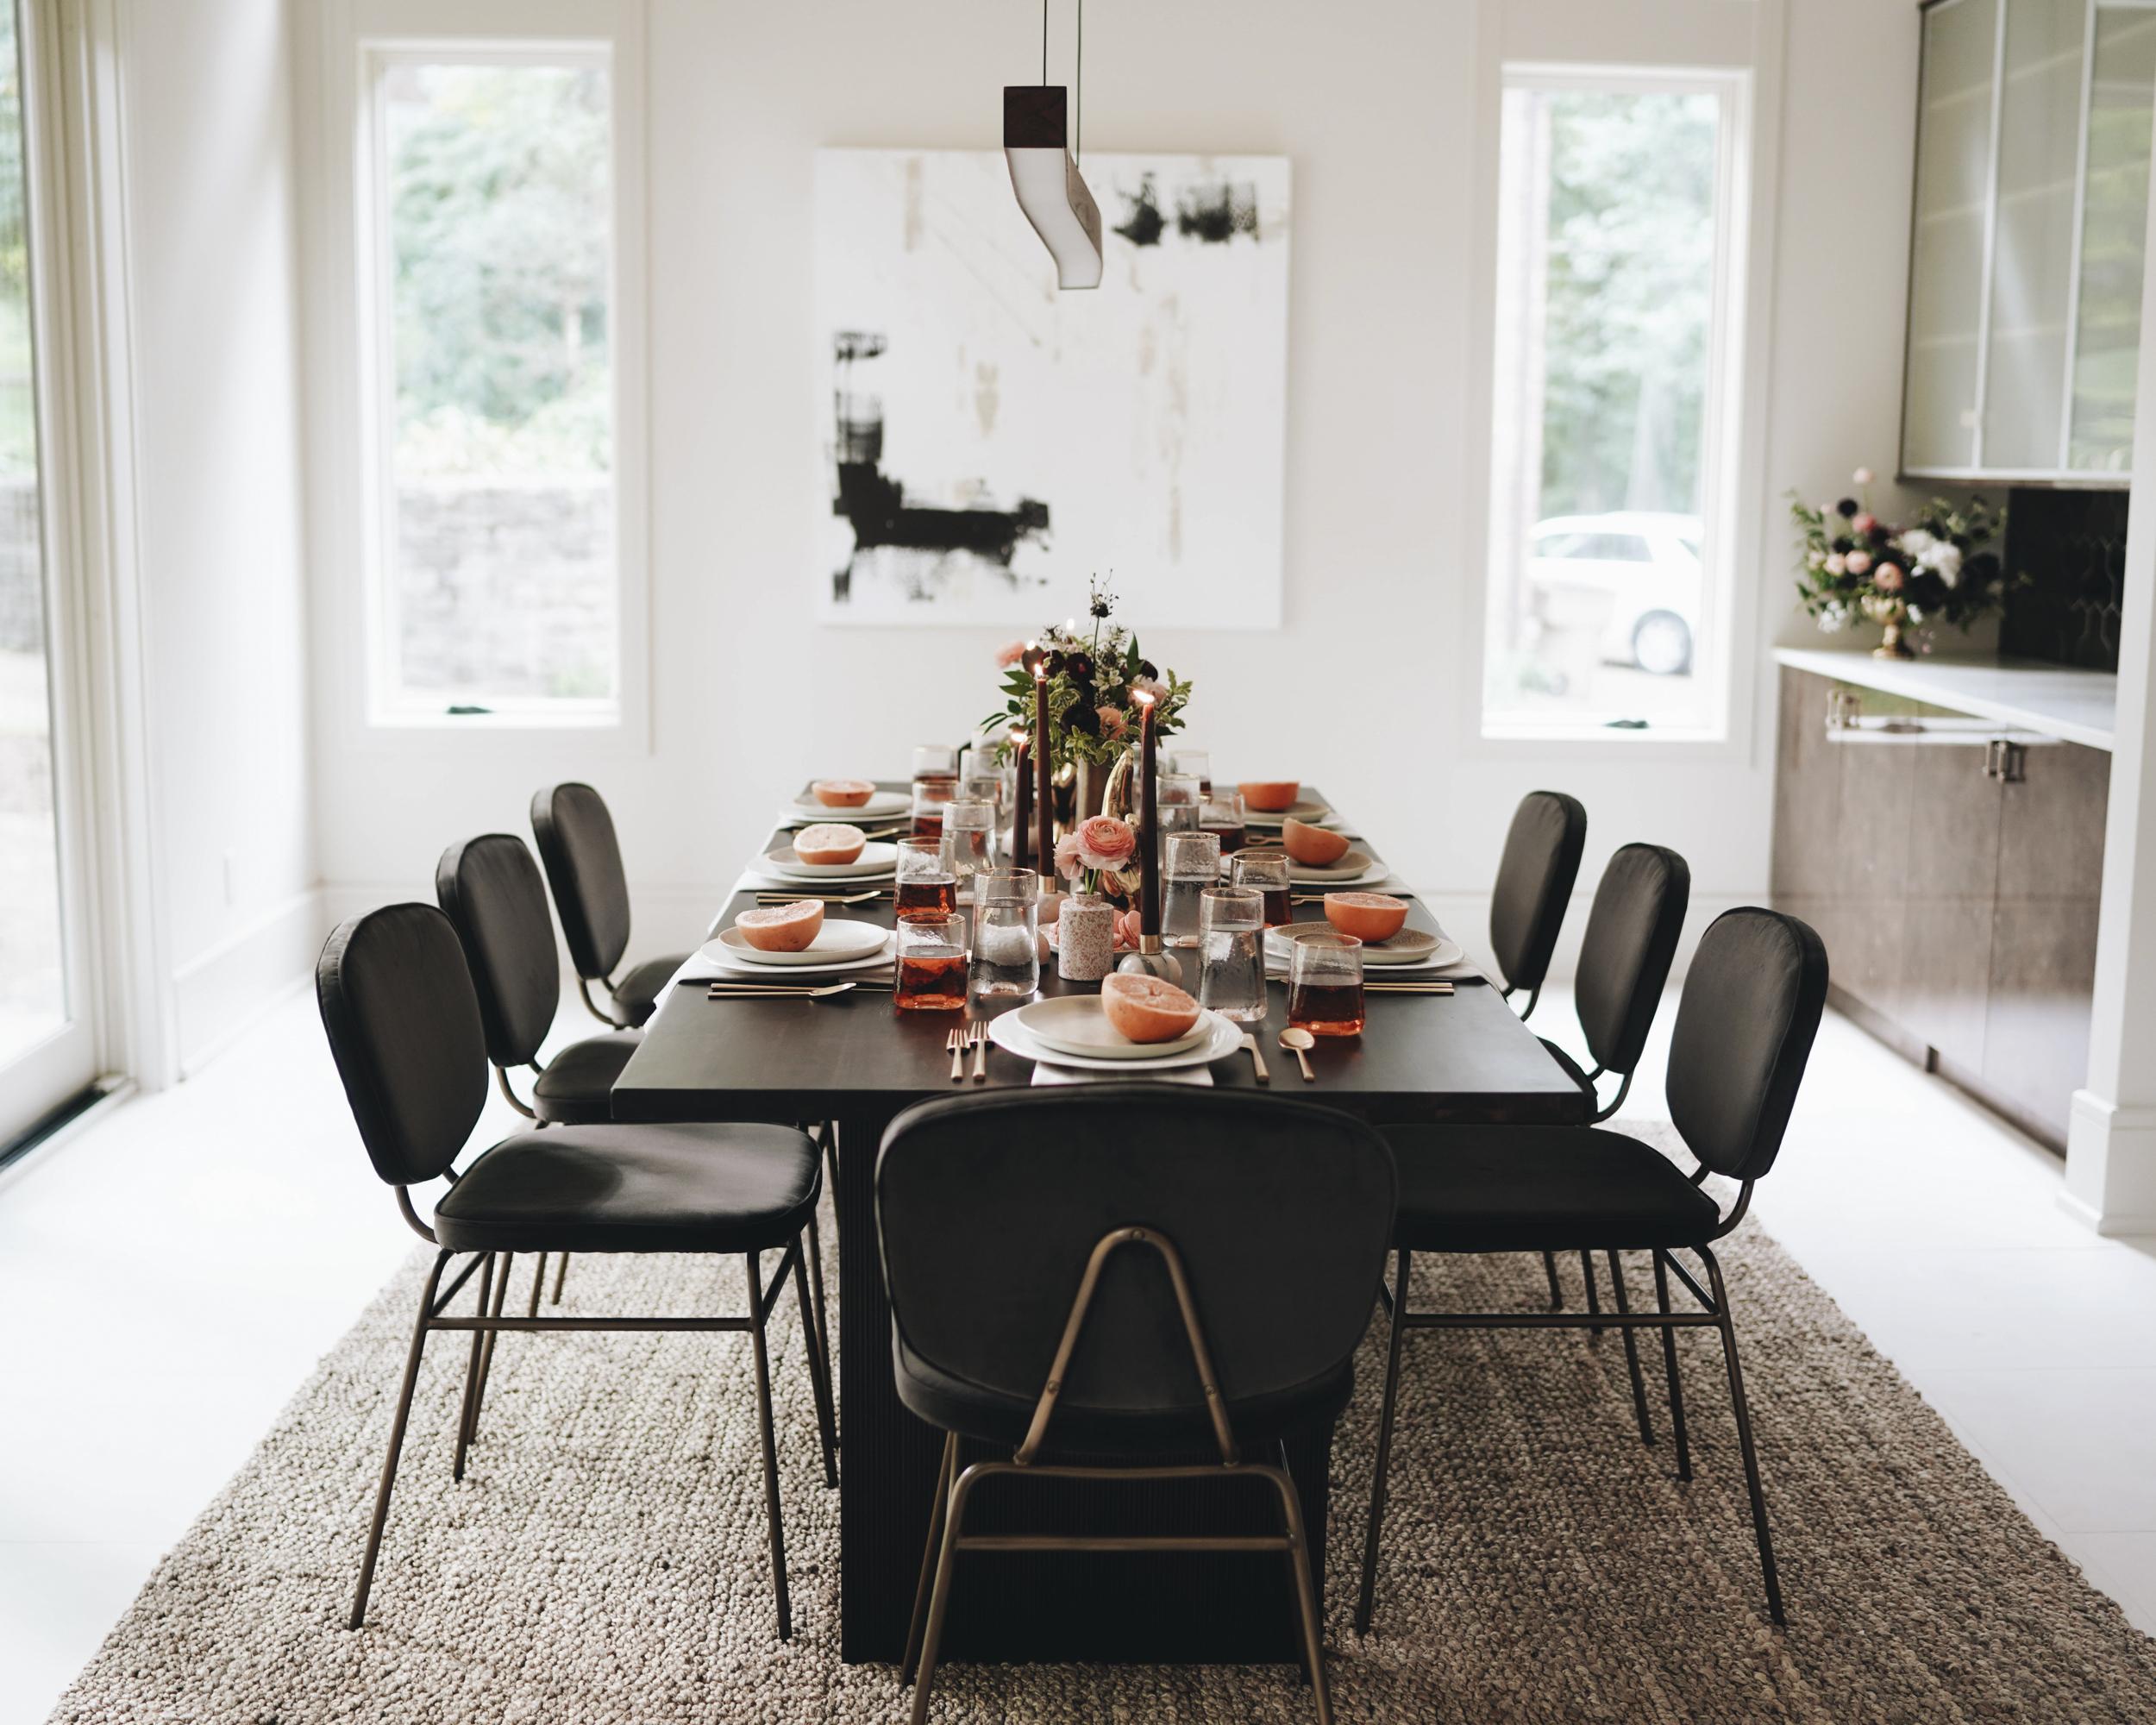 15-mayker-happily-grey-rosé-tablescape.jpg